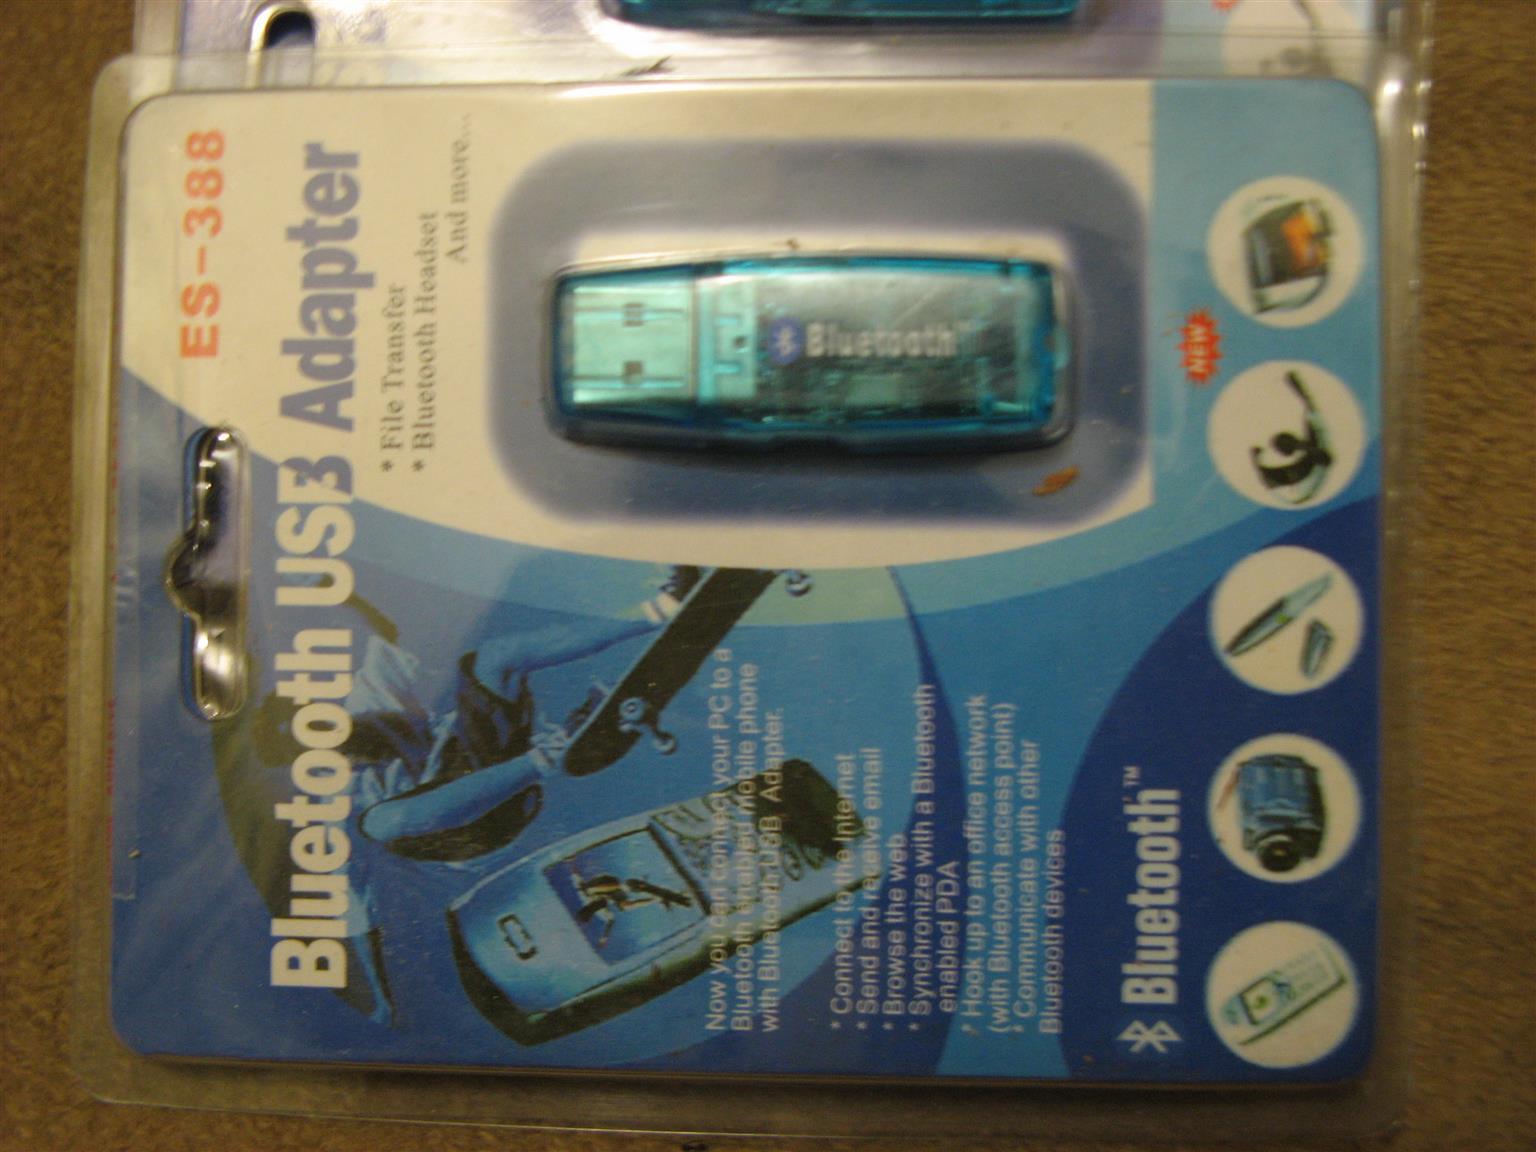 Bluetooth USB adapters